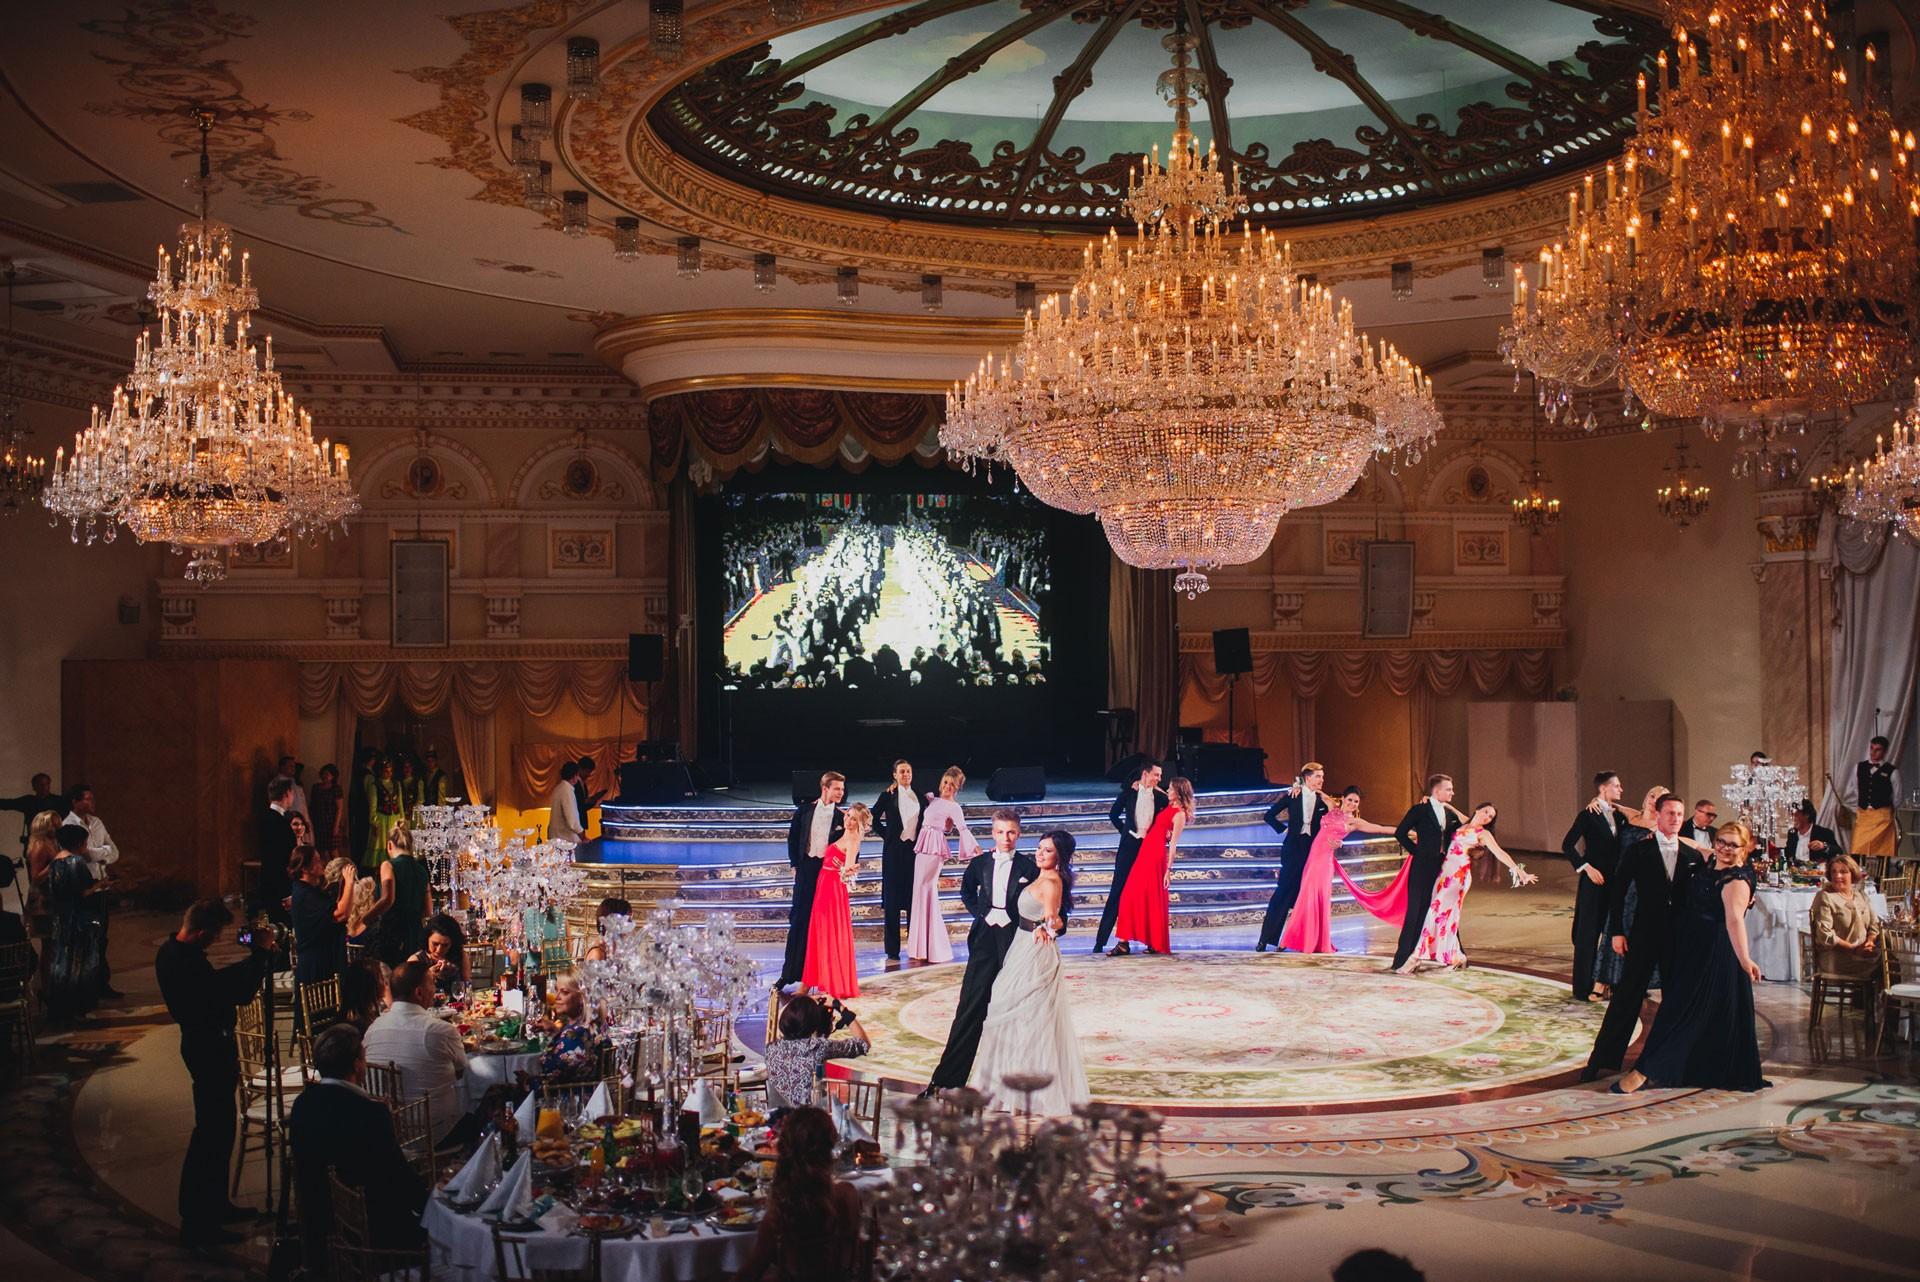 Свадьба Ксении Сябитовой и Андрея Снеткова фото 15